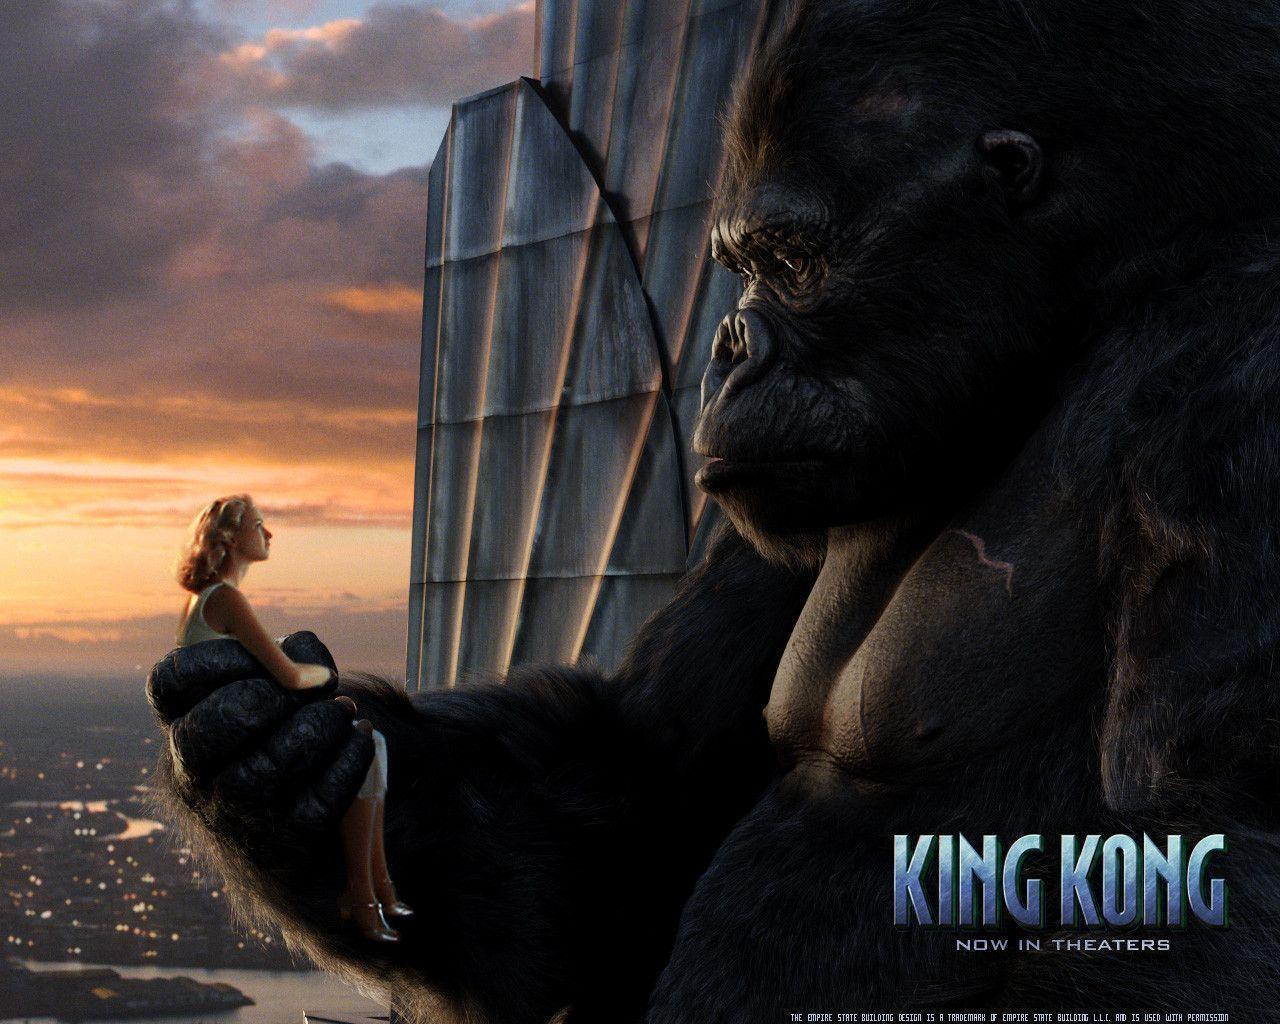 King kong wallpapers